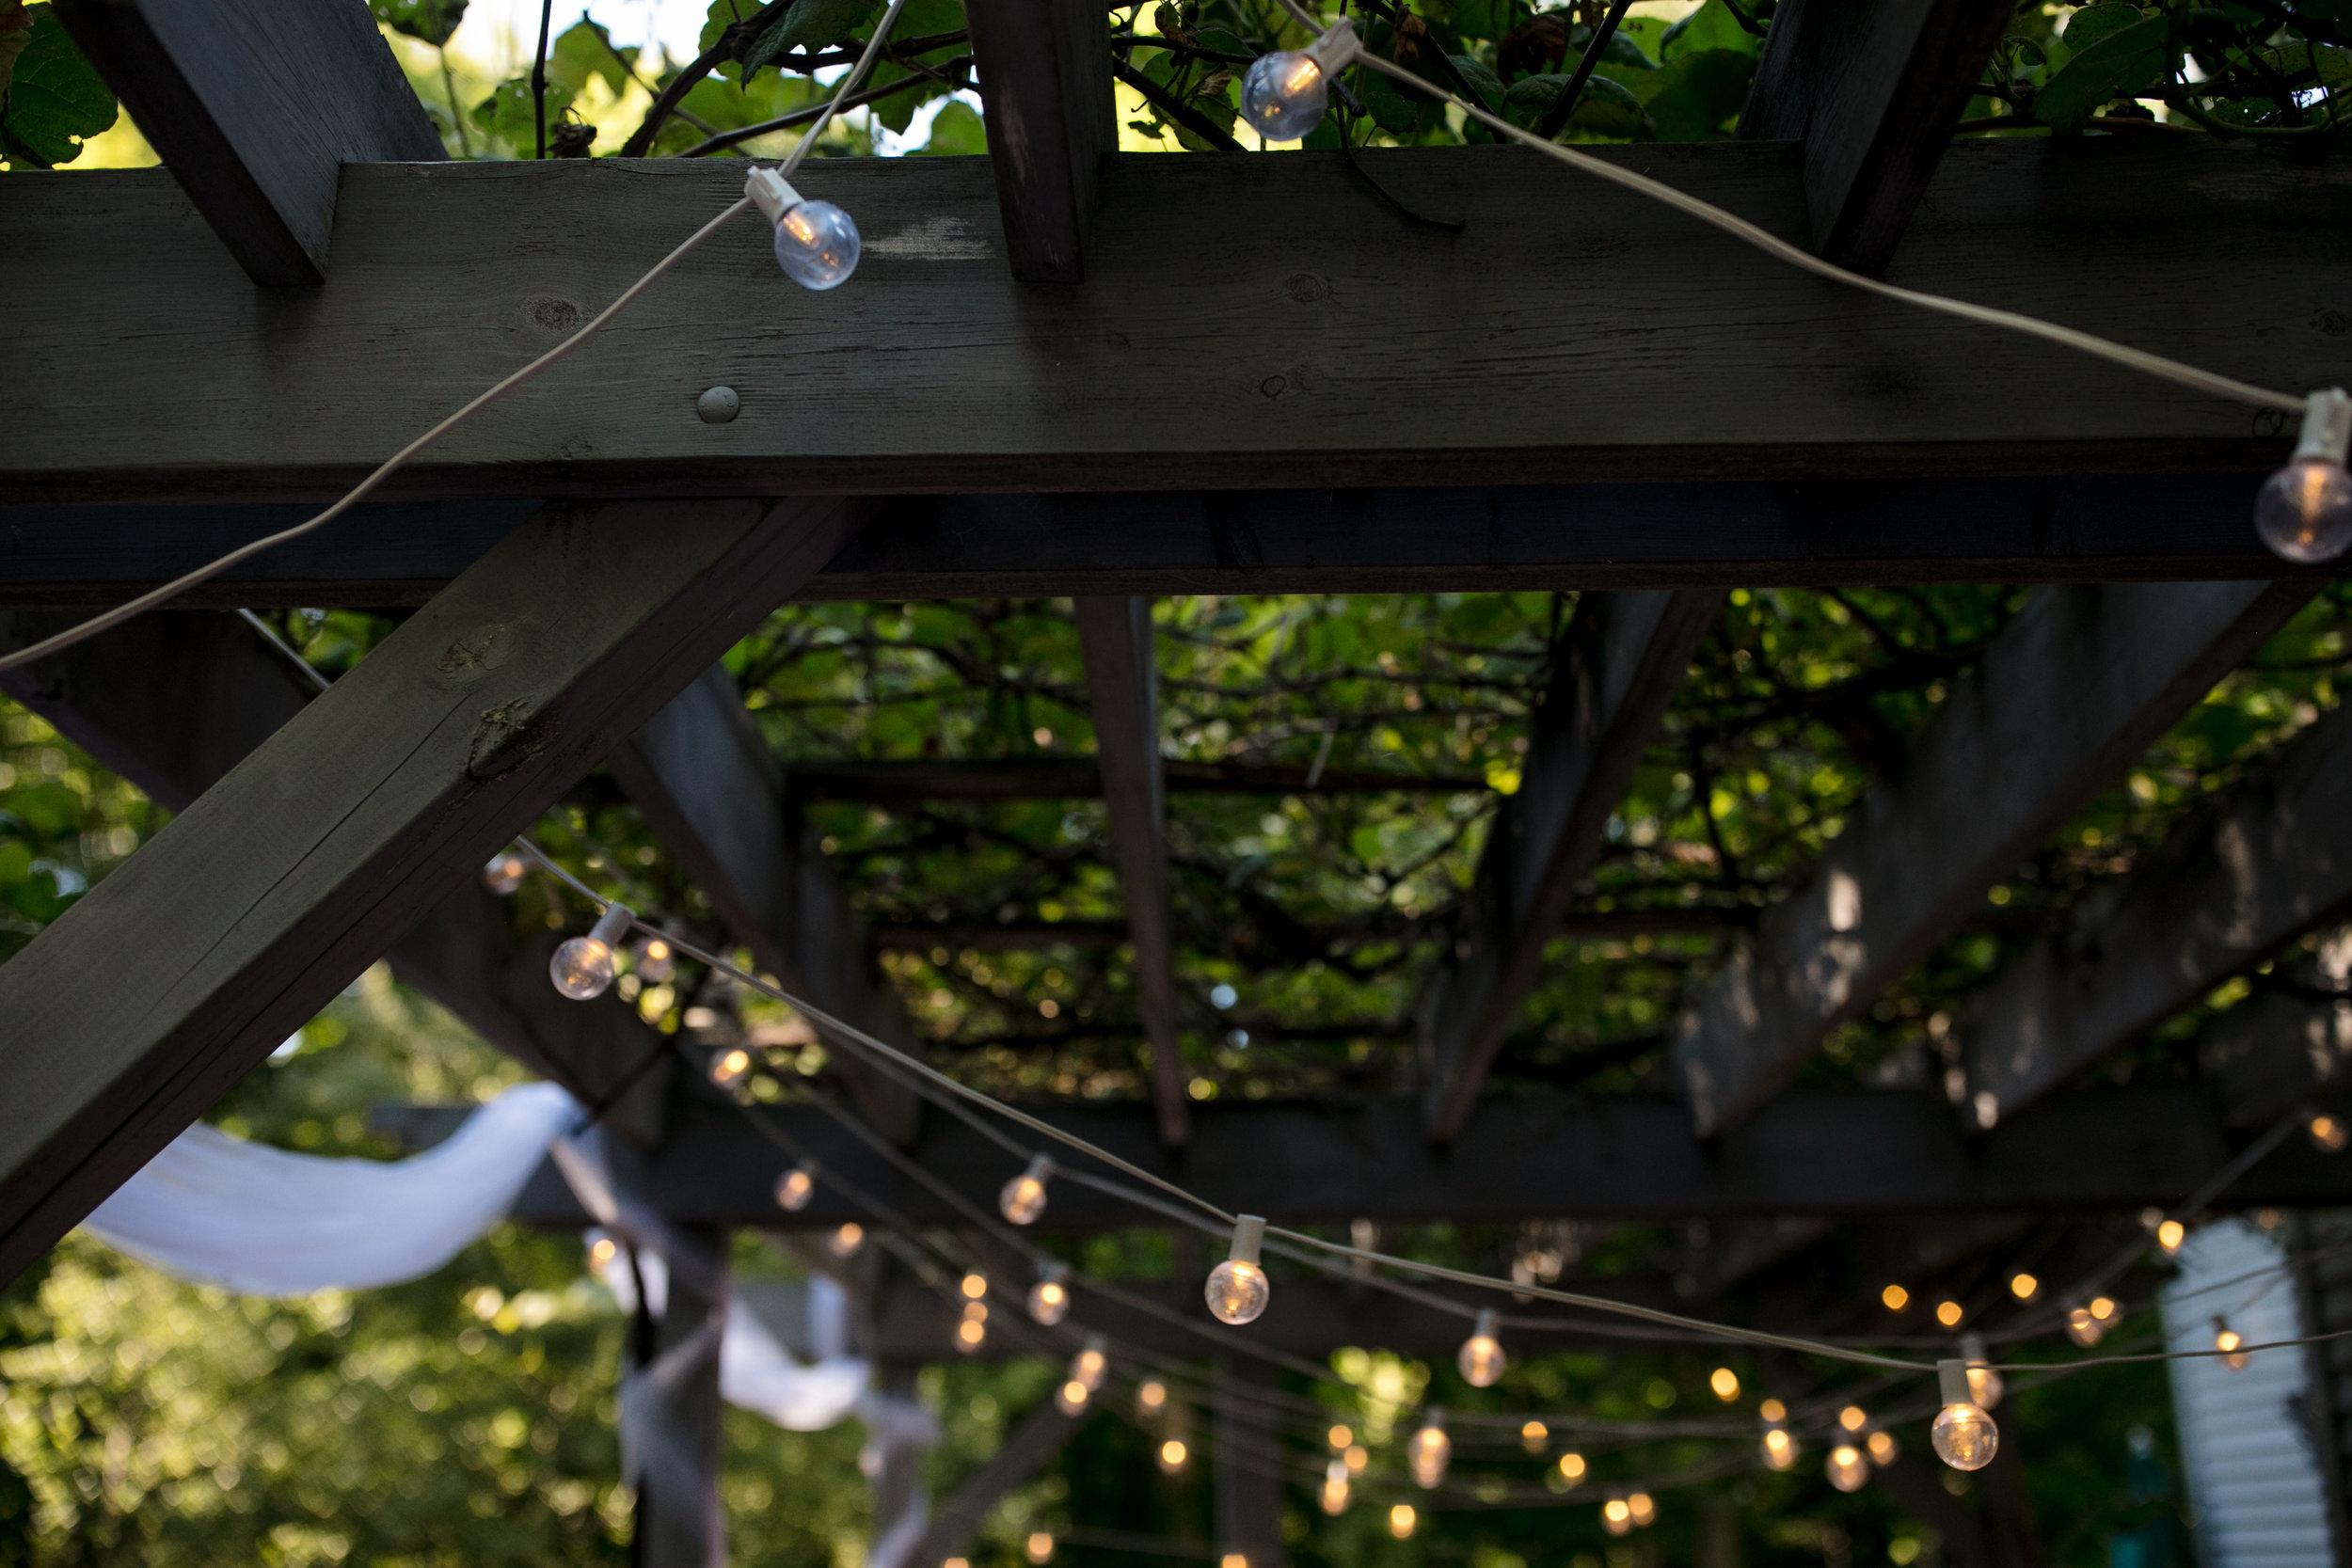 ludington-michigan-intimate-backyard-wedding-jessica-nolan196.jpg